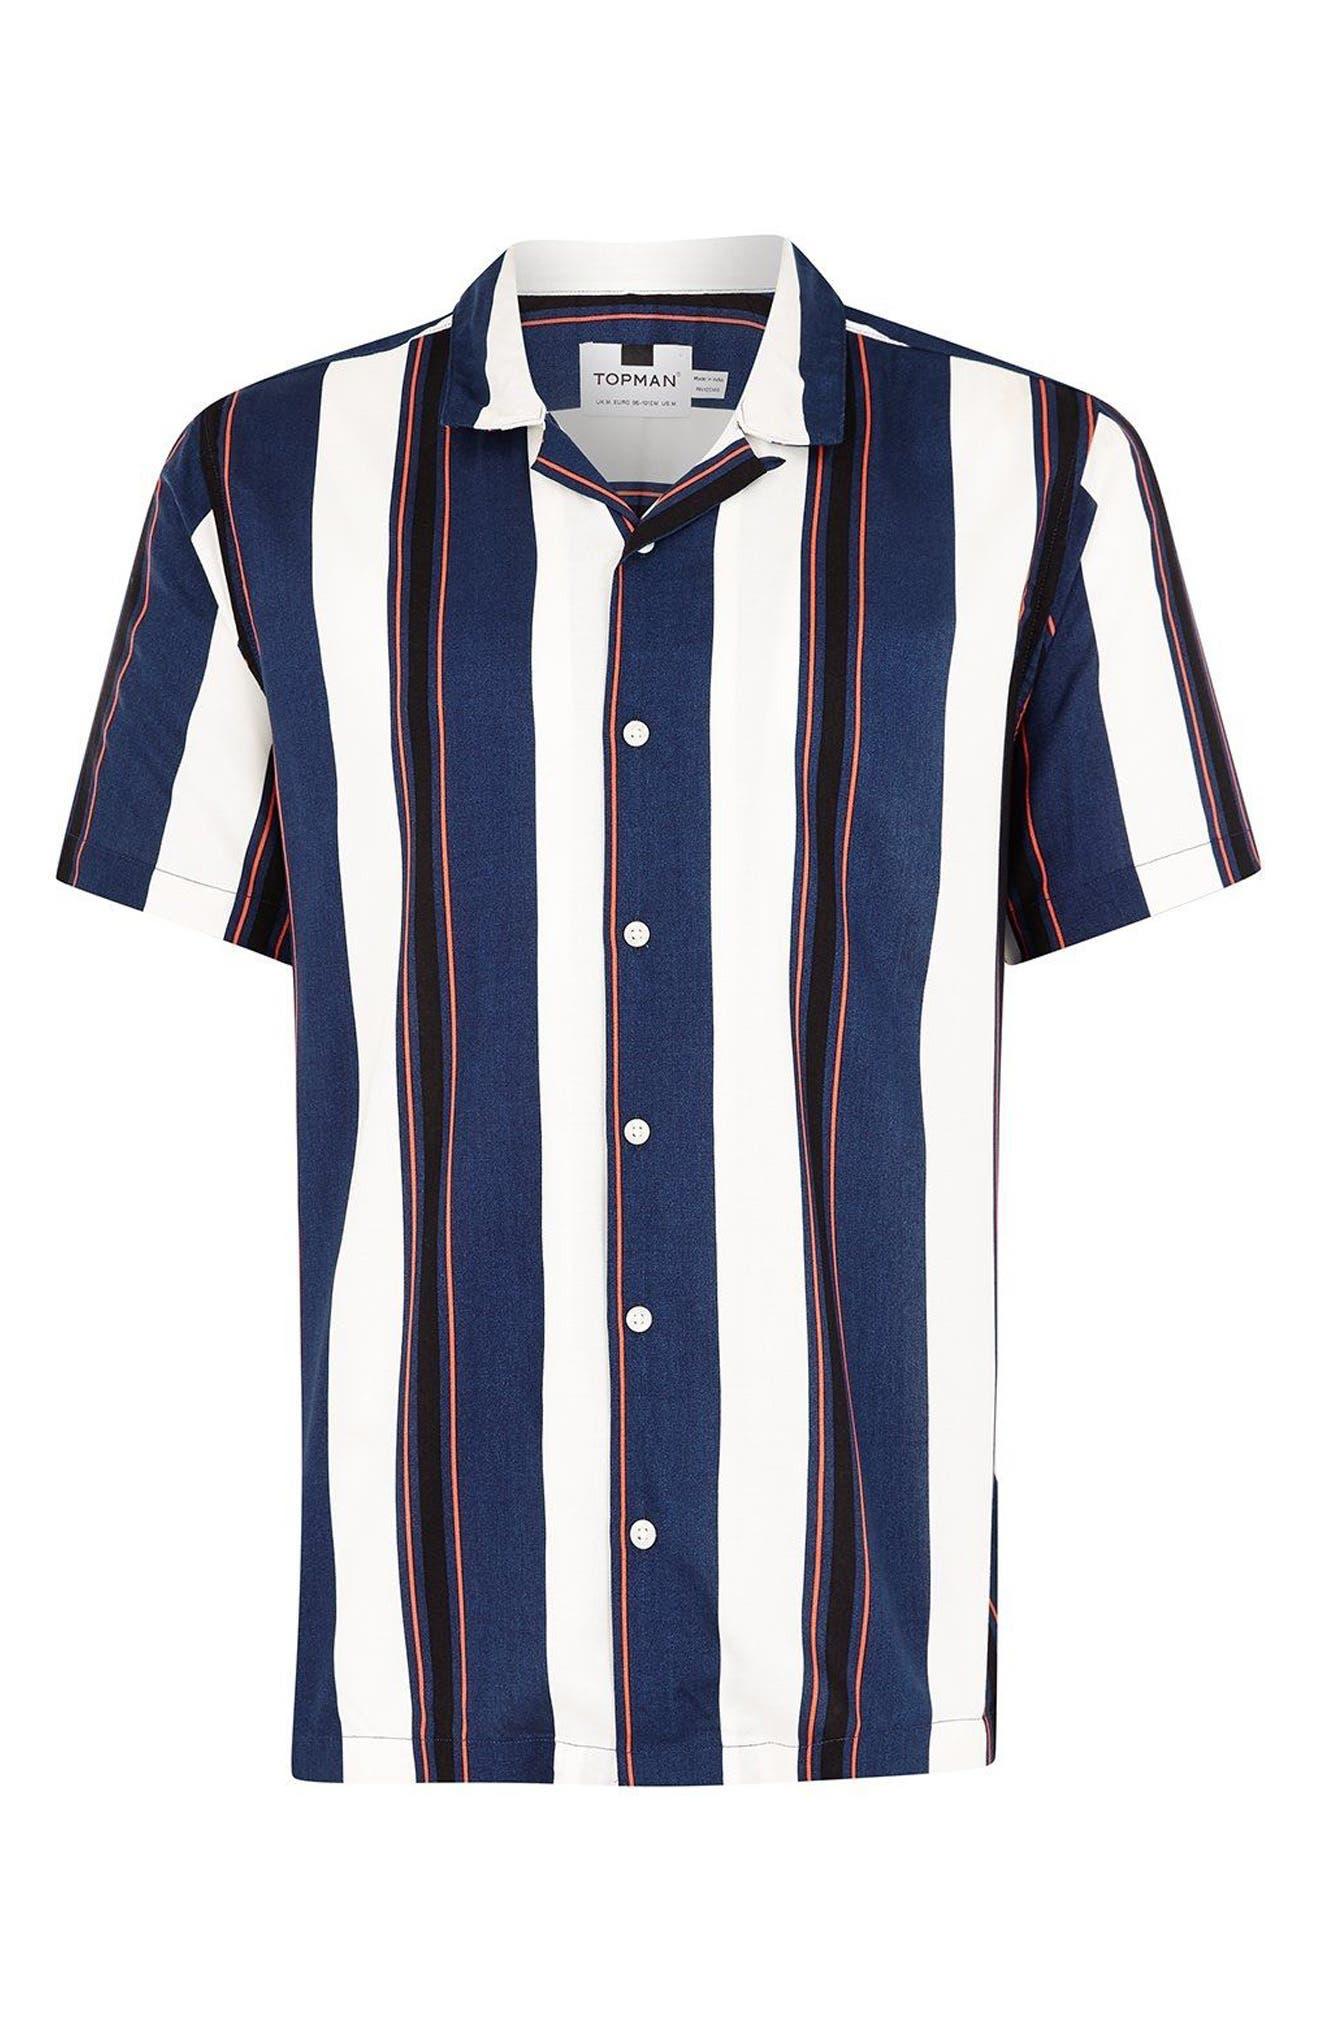 TOPMAN,                             Stripe Camp Shirt,                             Alternate thumbnail 4, color,                             410